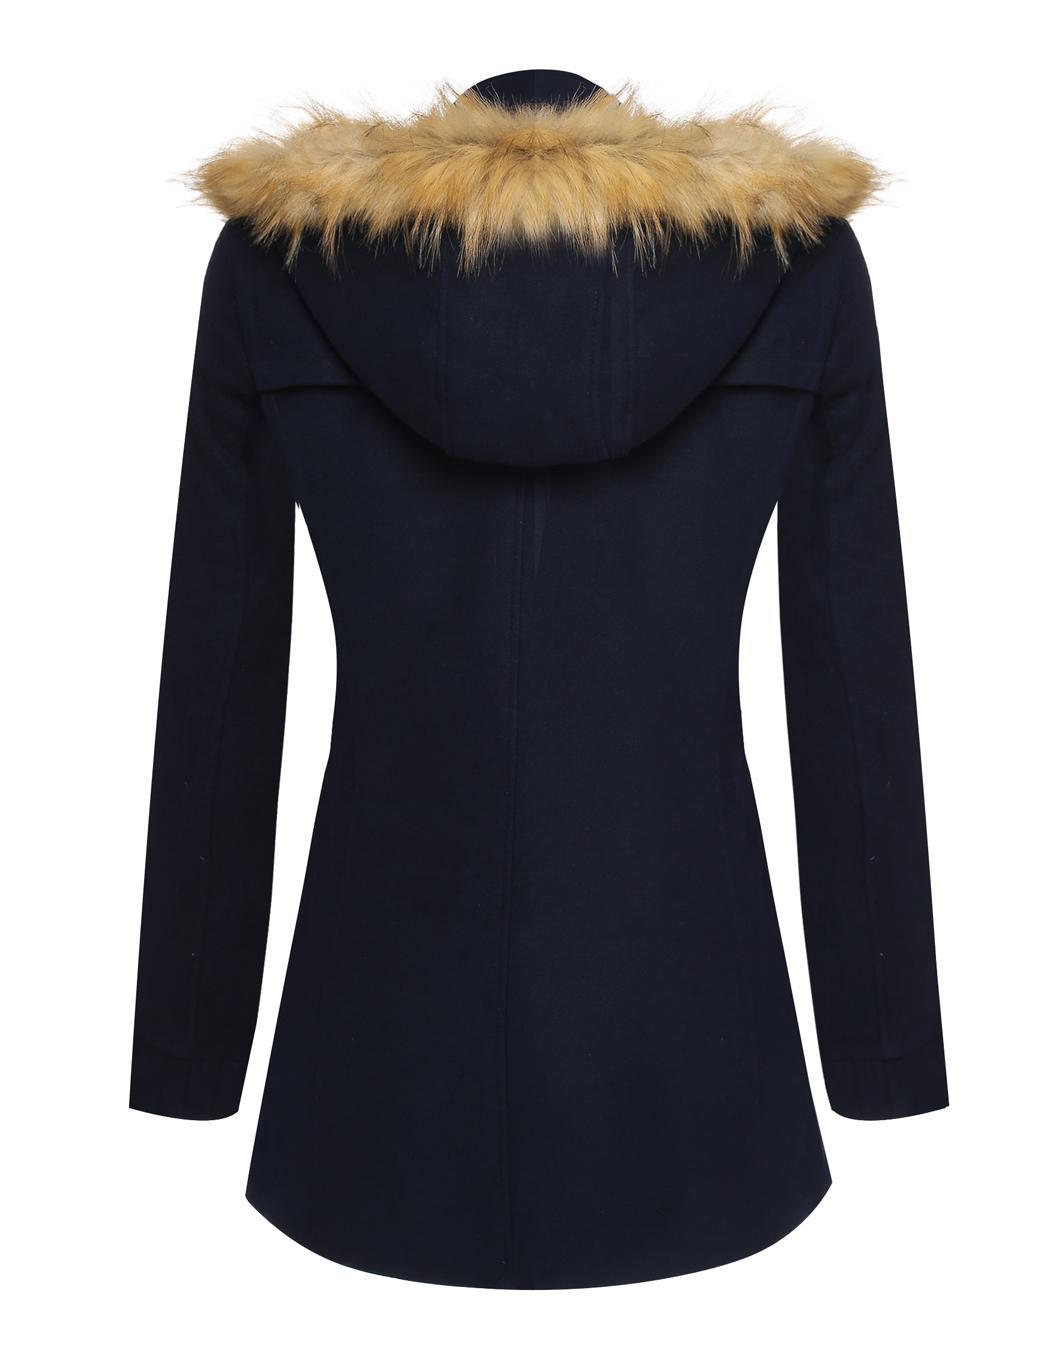 Women Detachable Faux Fur Hooded Long Solid Slim Wool Blend Coat 4